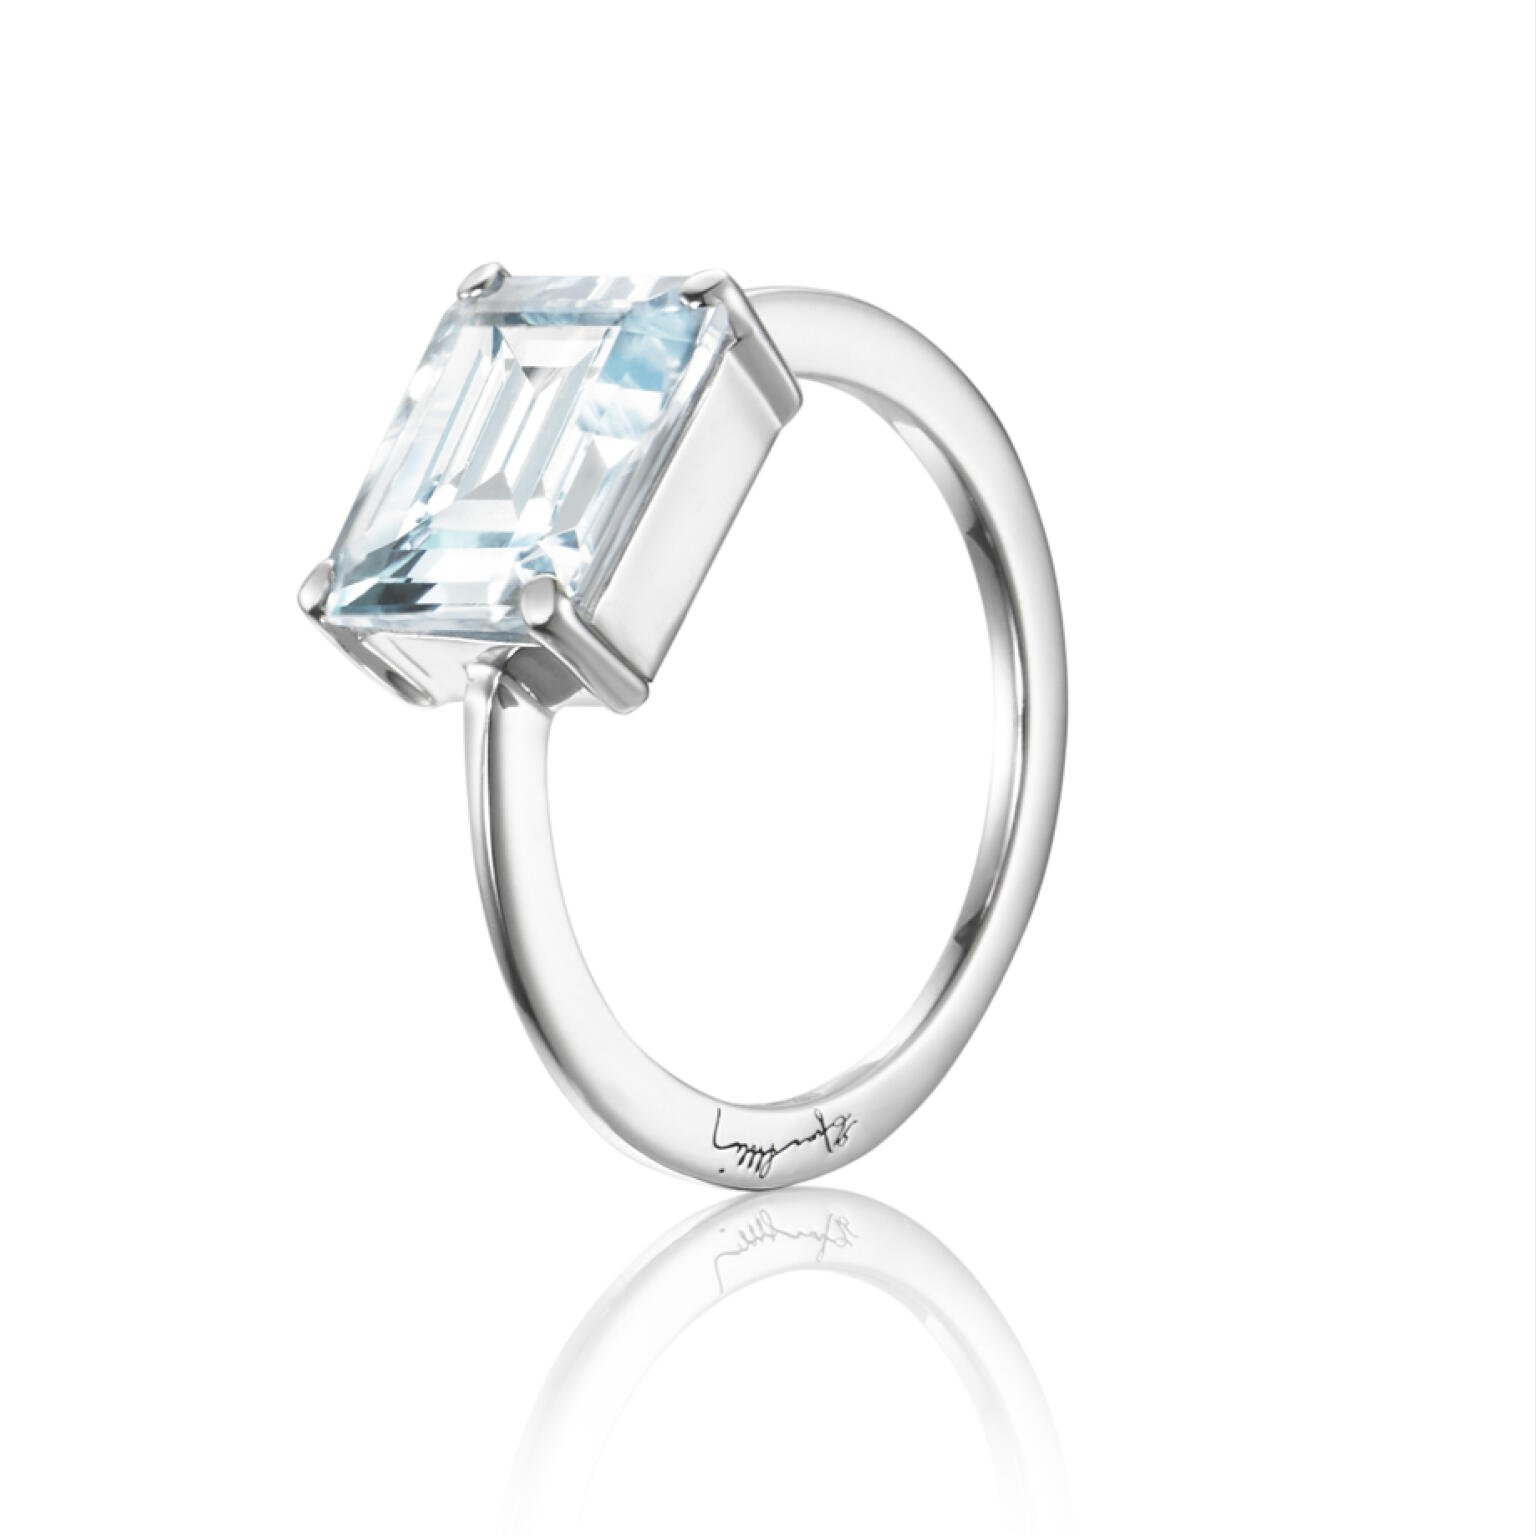 A Macaron Dream Ring – Silver